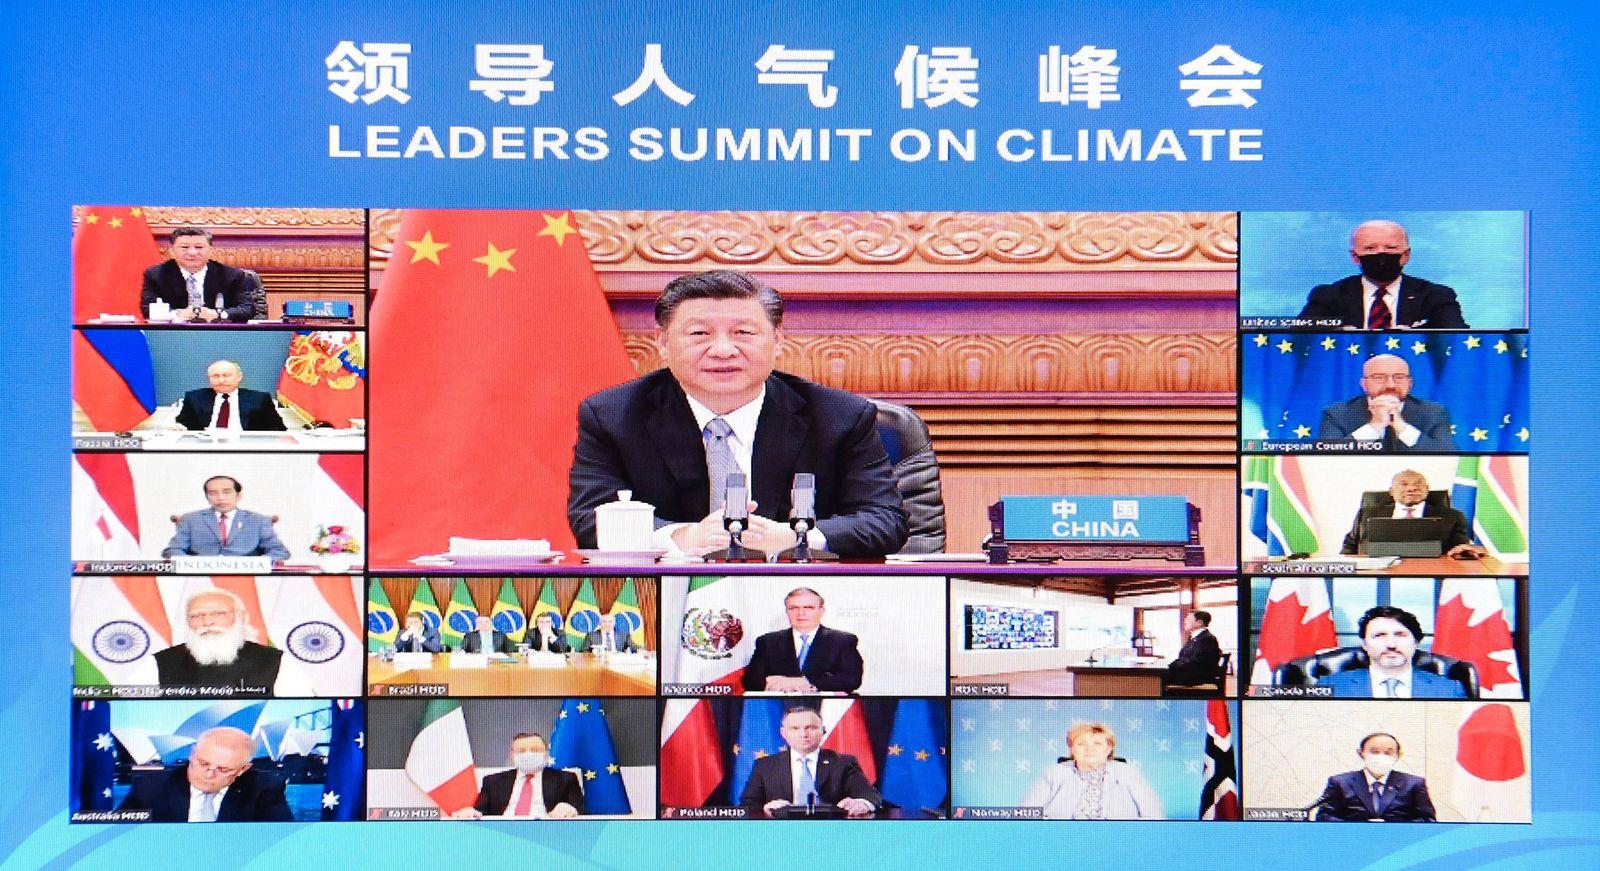 (210422) -- BEIJING, April 22, 2021 -- At the invitation of U.S. President Joe Biden, Chinese President Xi Jinping atte